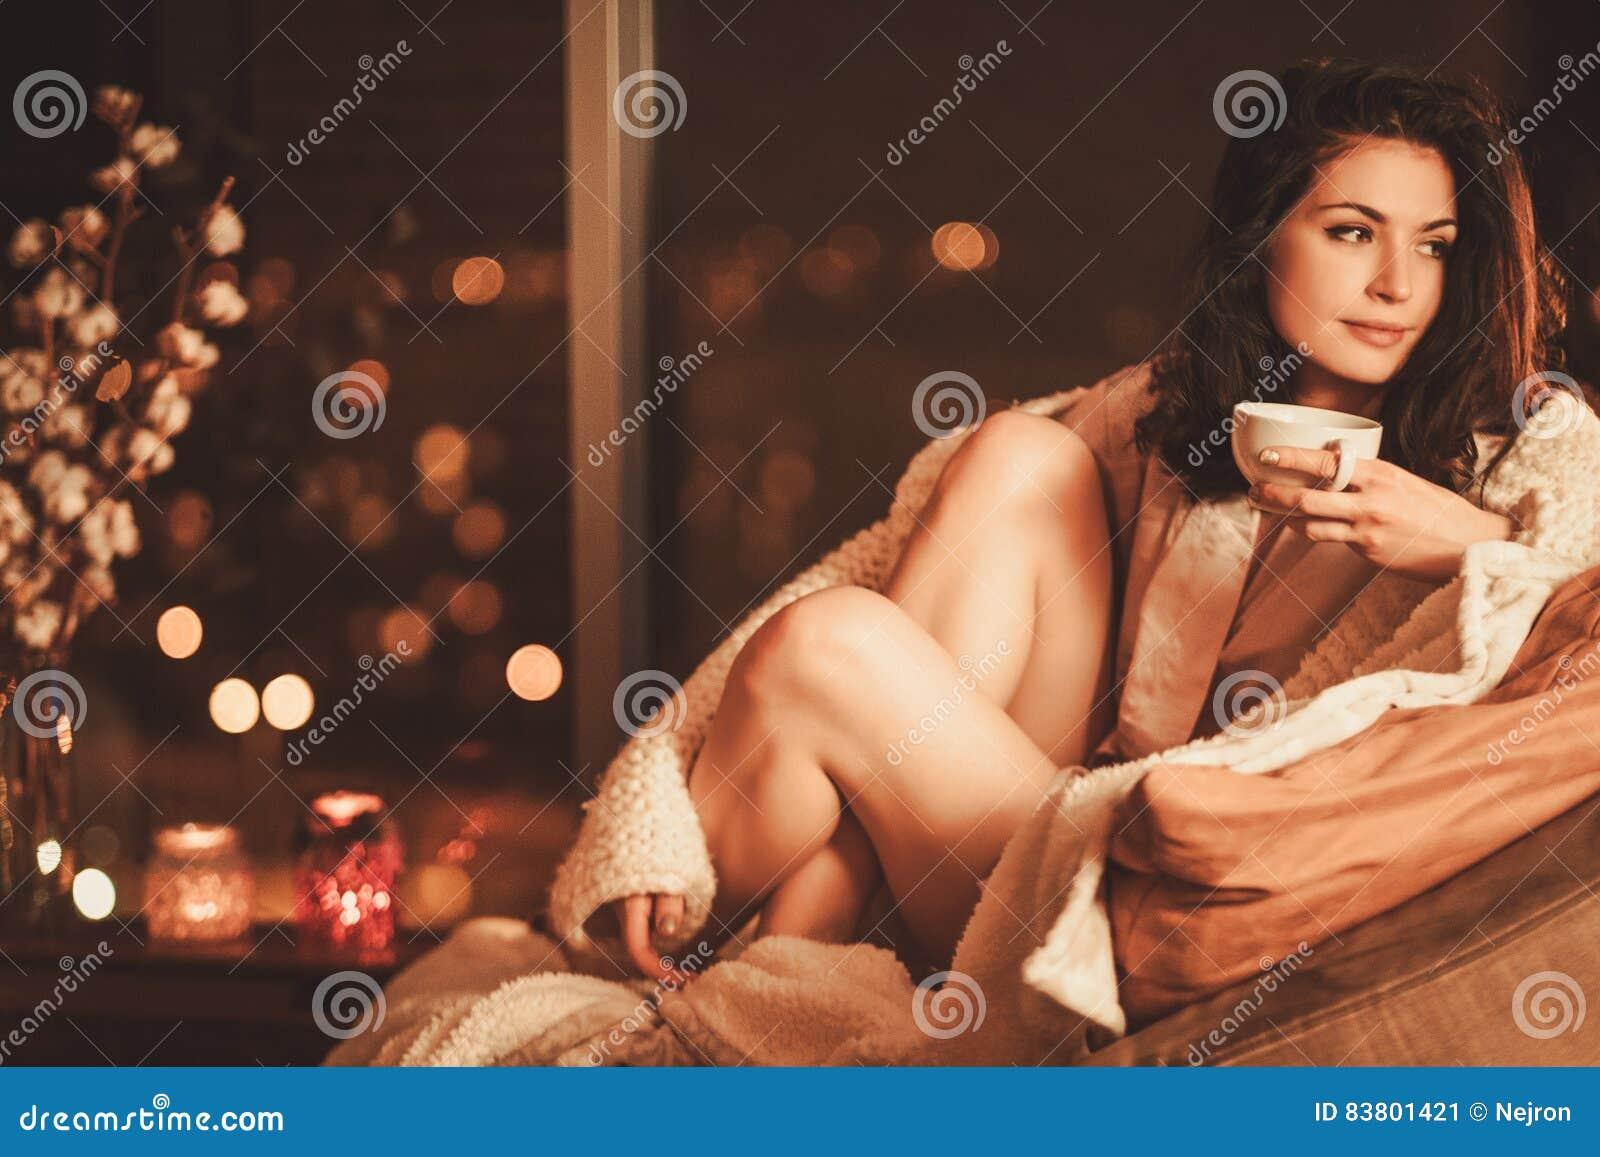 photo chaude femme